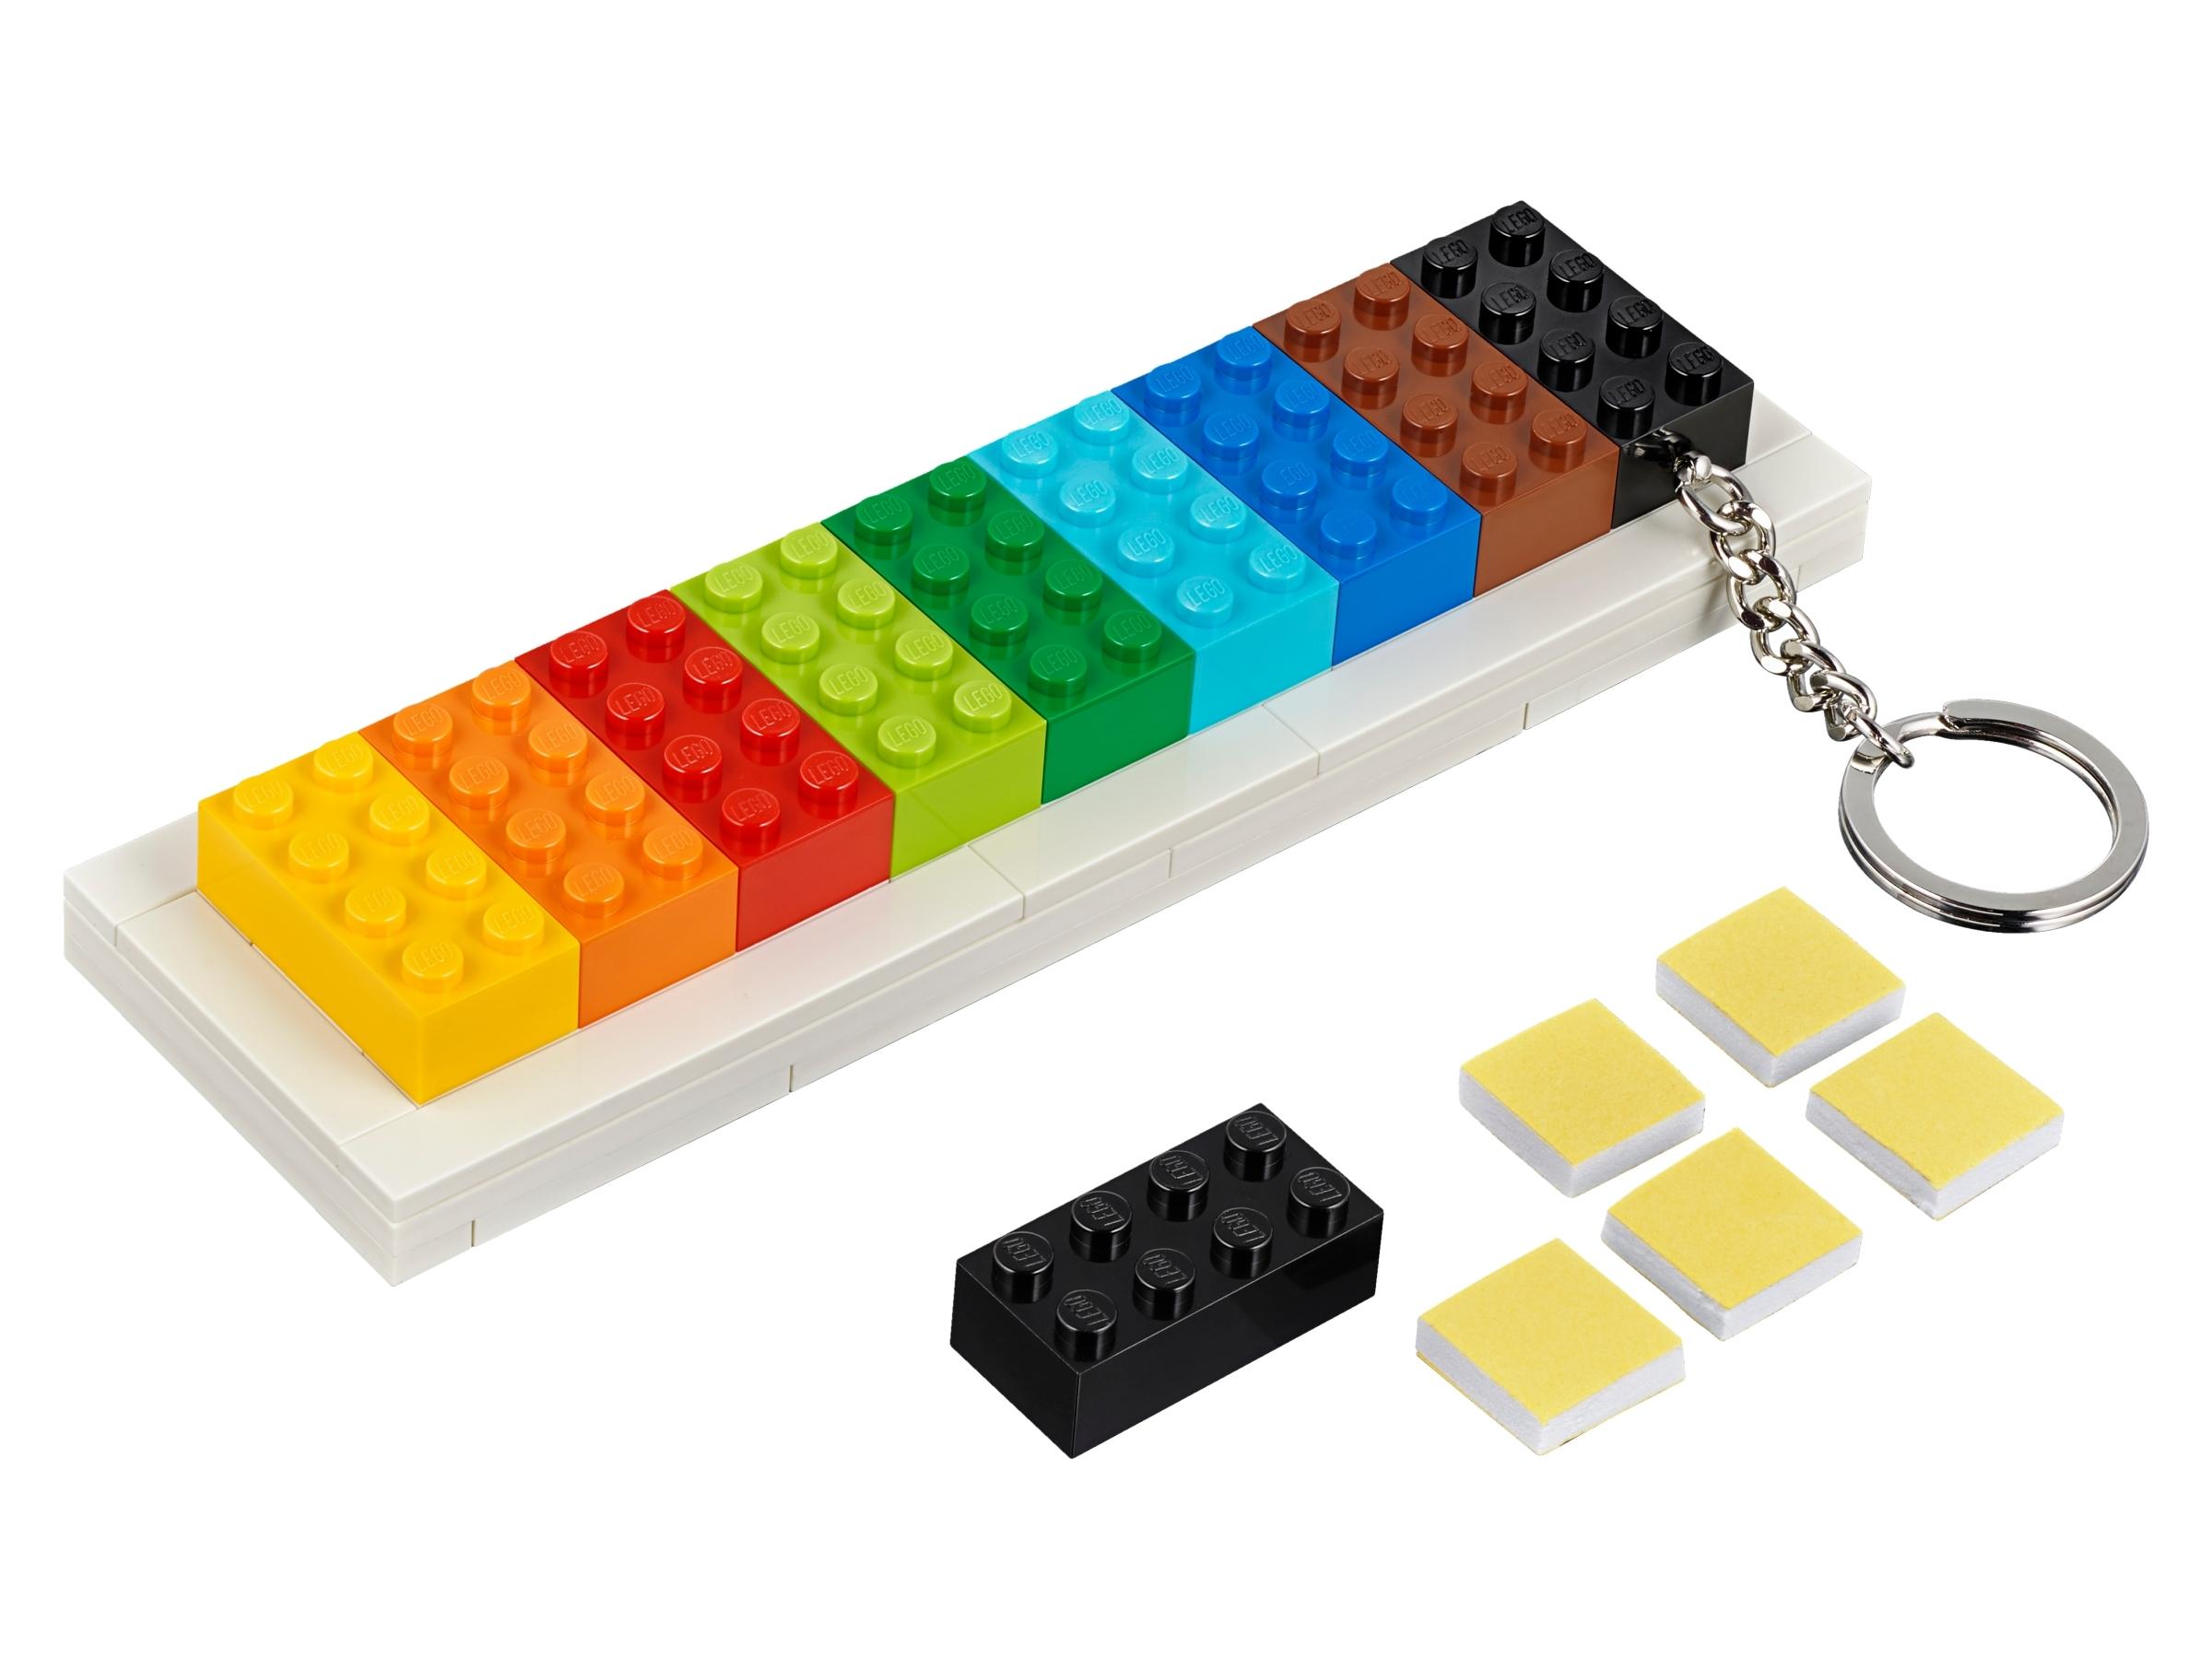 4 Custom Lego Tiles Warning Hazard Sign Electrical Tiles-Authentic LEGO Parts